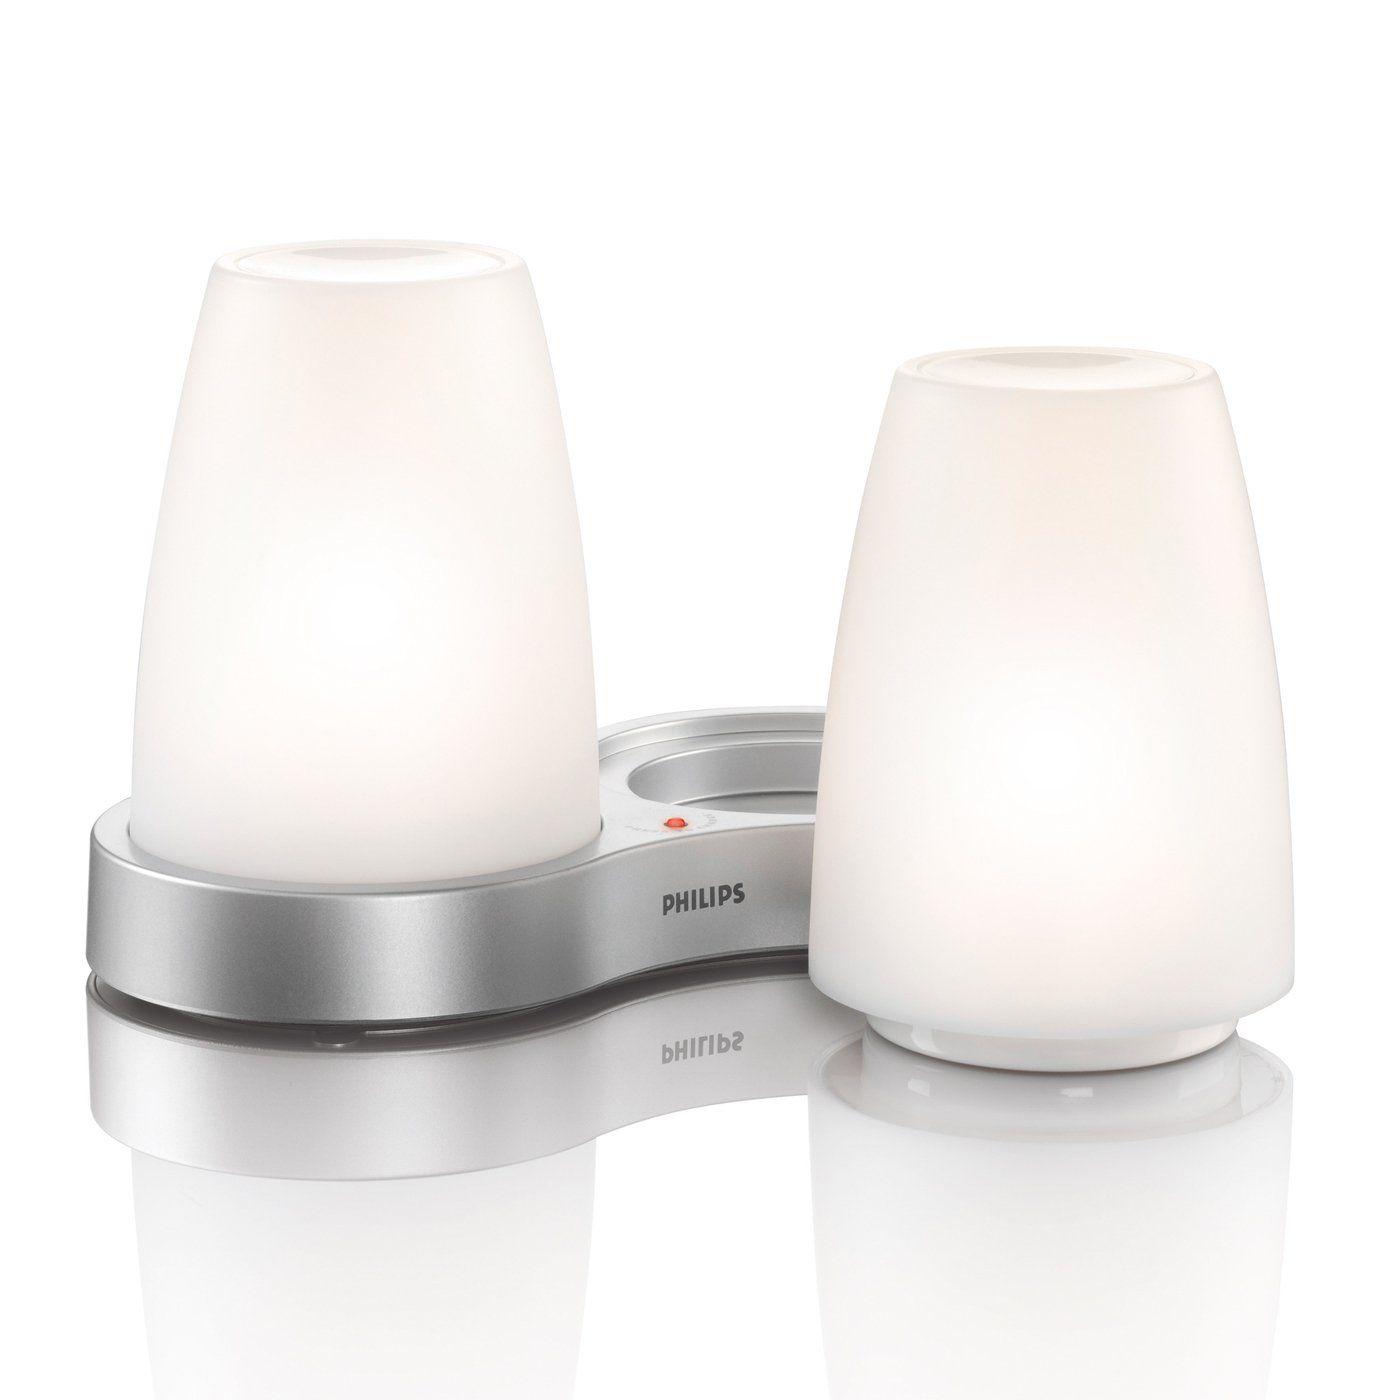 Philips 691106048 Home Lighting Accessories 6 Light Imageo LED ...